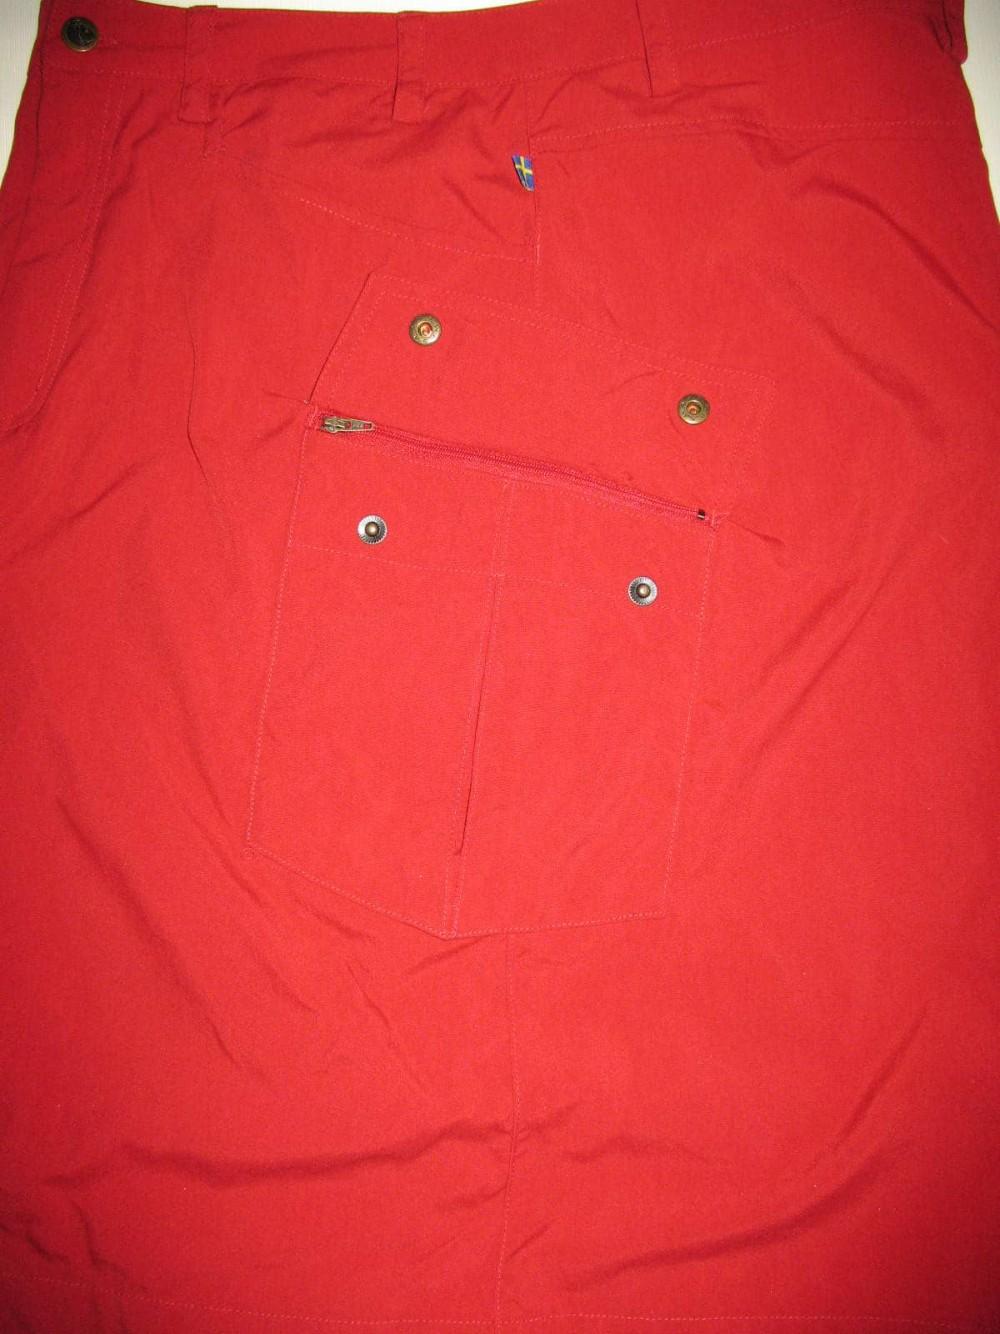 Юбка FJALLRAVEN outdoor skirt lady (размер 40/L) - 5